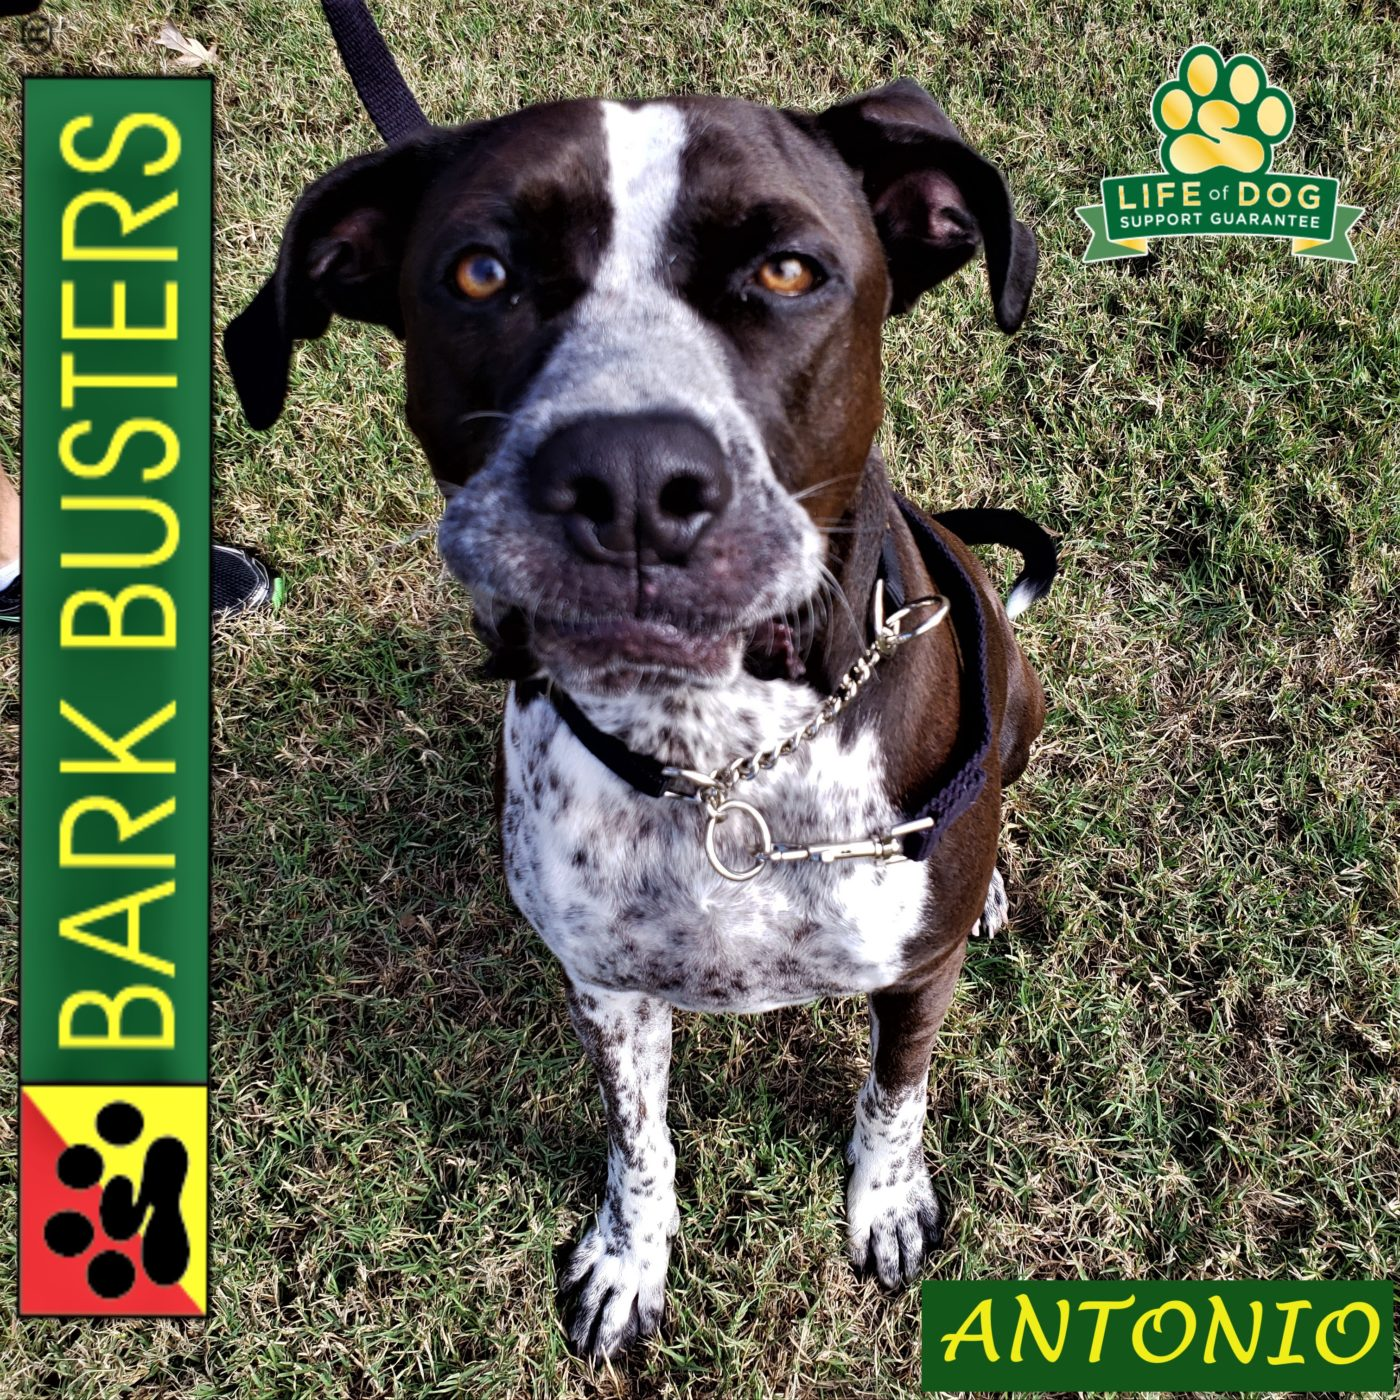 #germanshorthairedpointer #labradorretriever #mixeddogsrule #leashtraining #fearfuldog #obediencetraining #dogtrainingmanor #dogtrainingnearme #barkbusters #inhomedogtraining